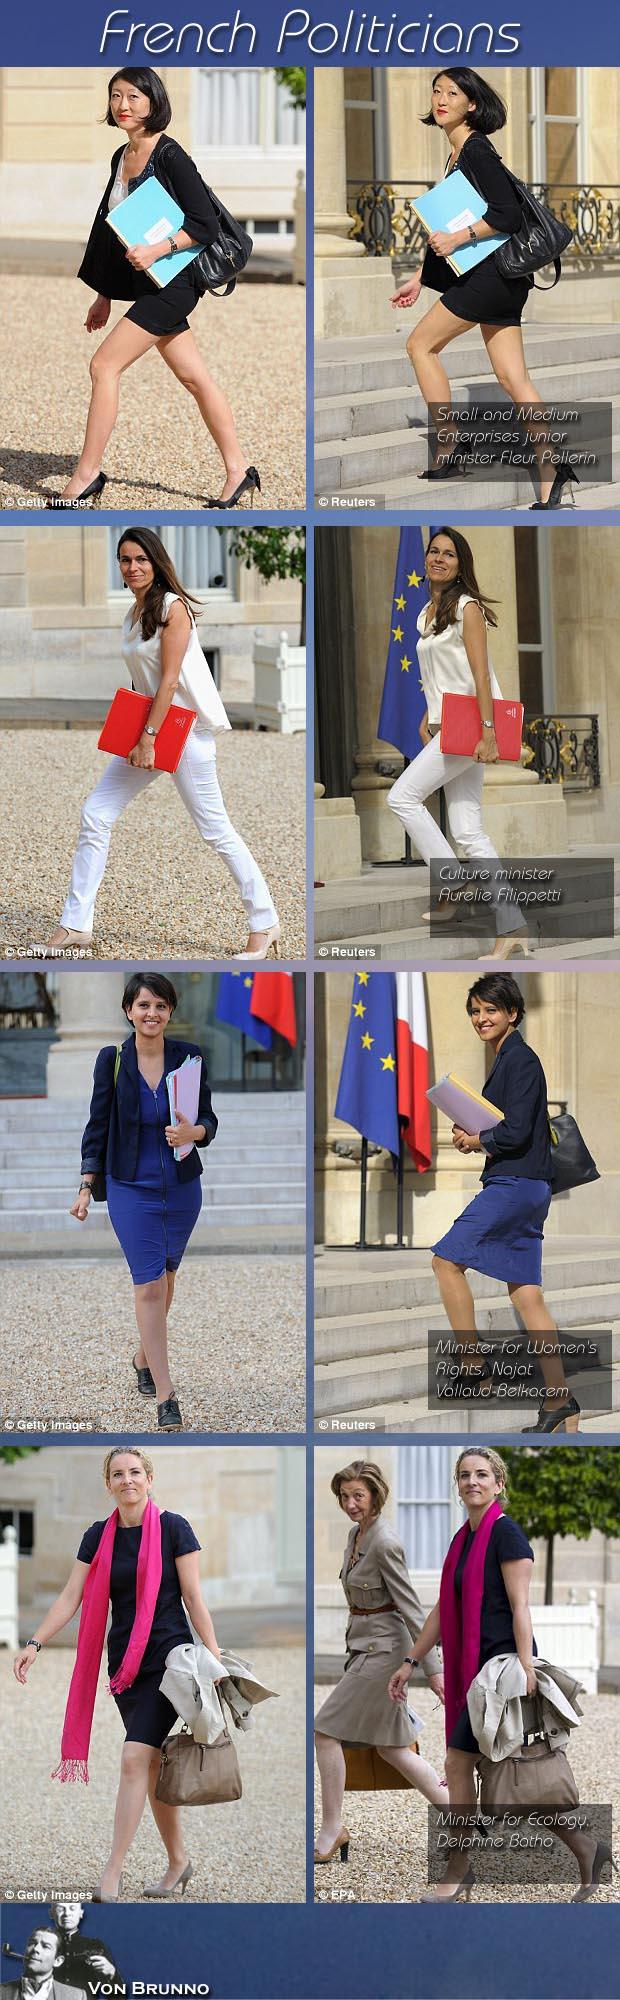 french_politicians.jpg (221 KB)